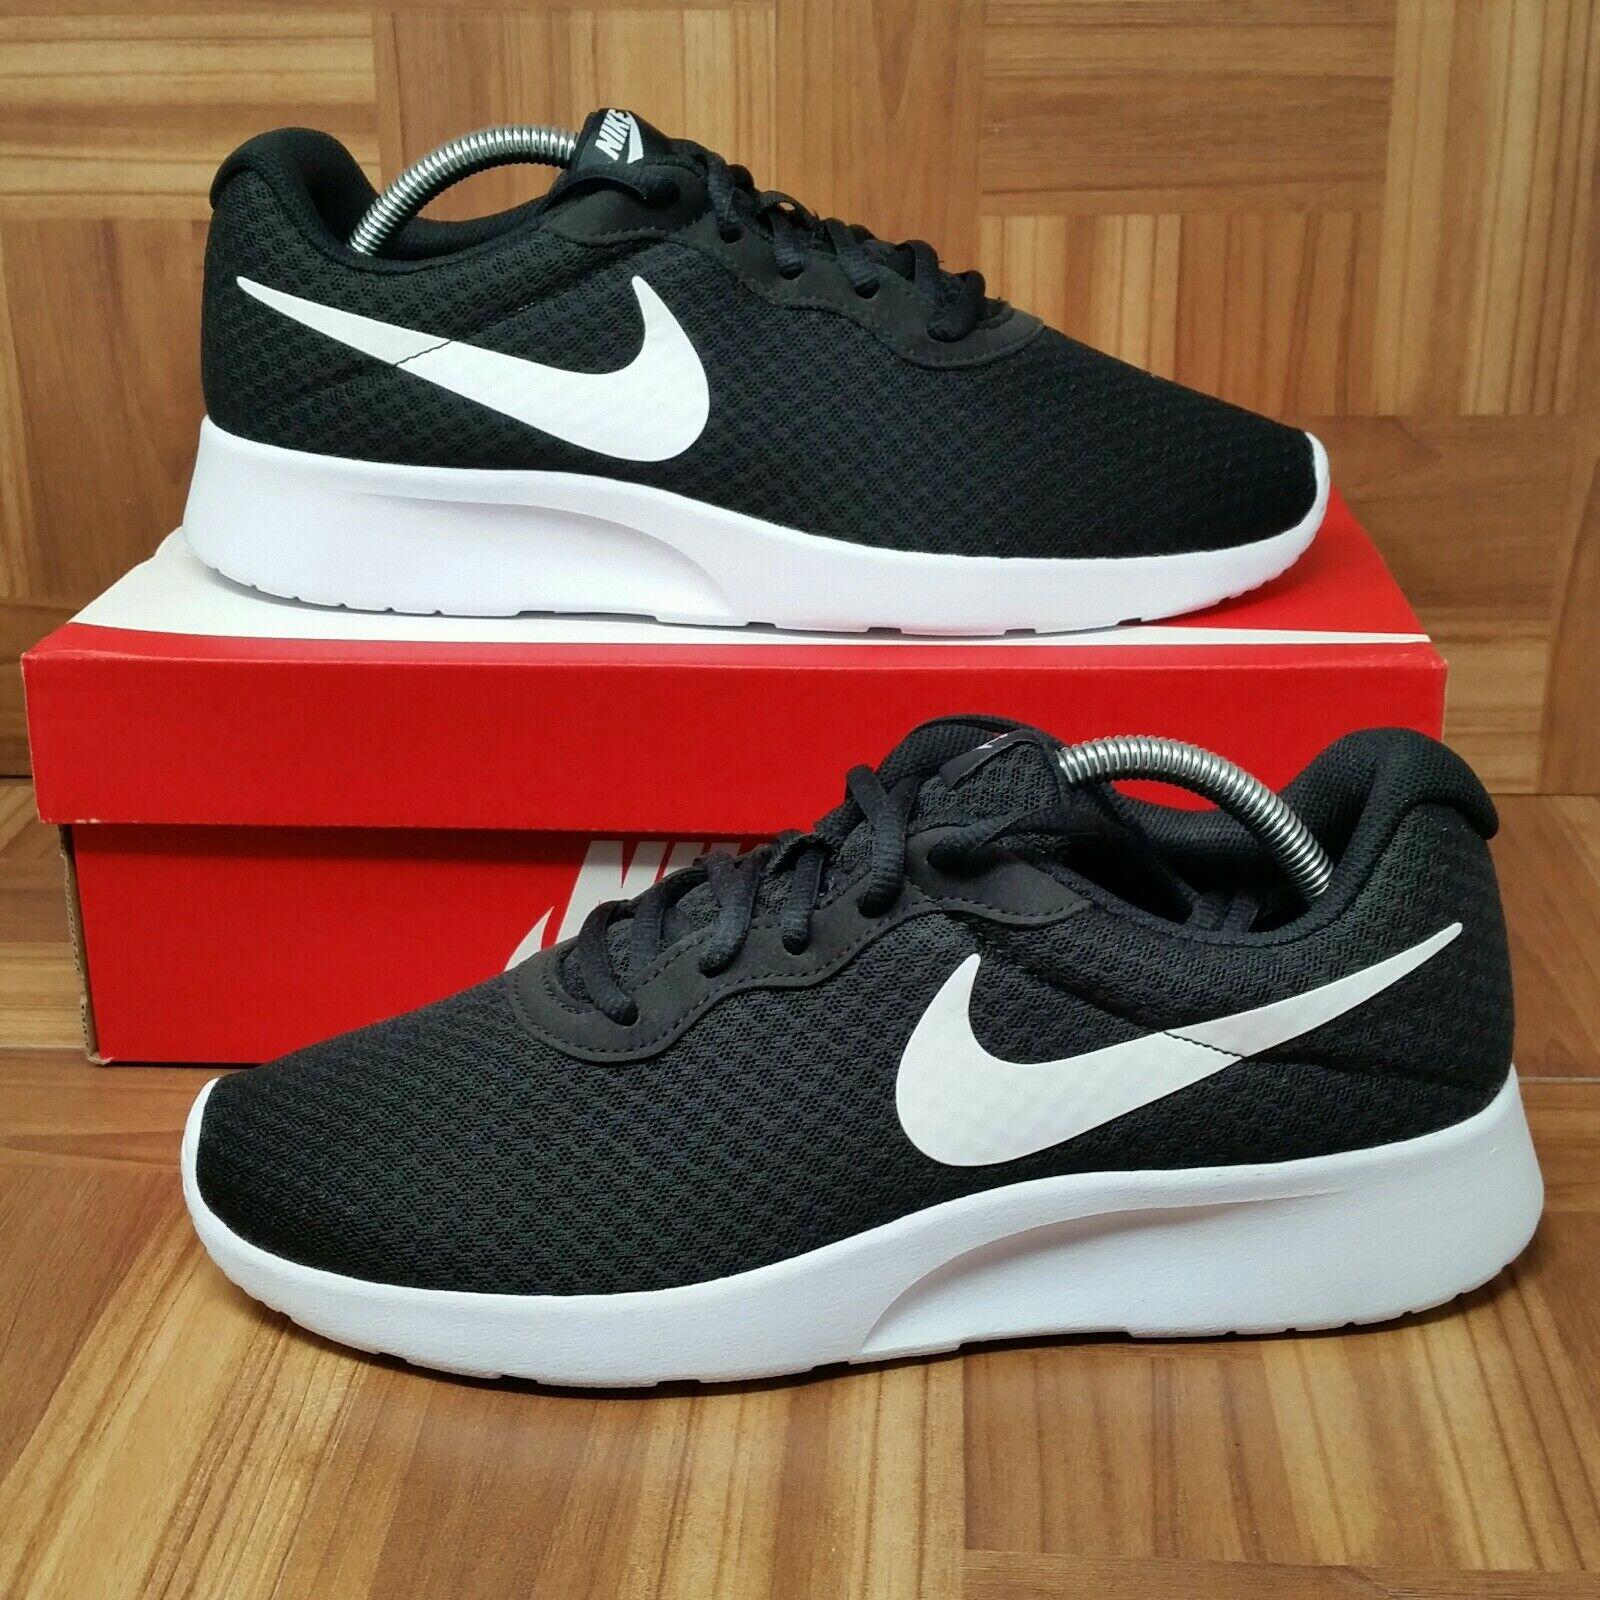 NEW Nike Air Tanjun (Men's Size 9) Running Sneaker shoes Black White Max